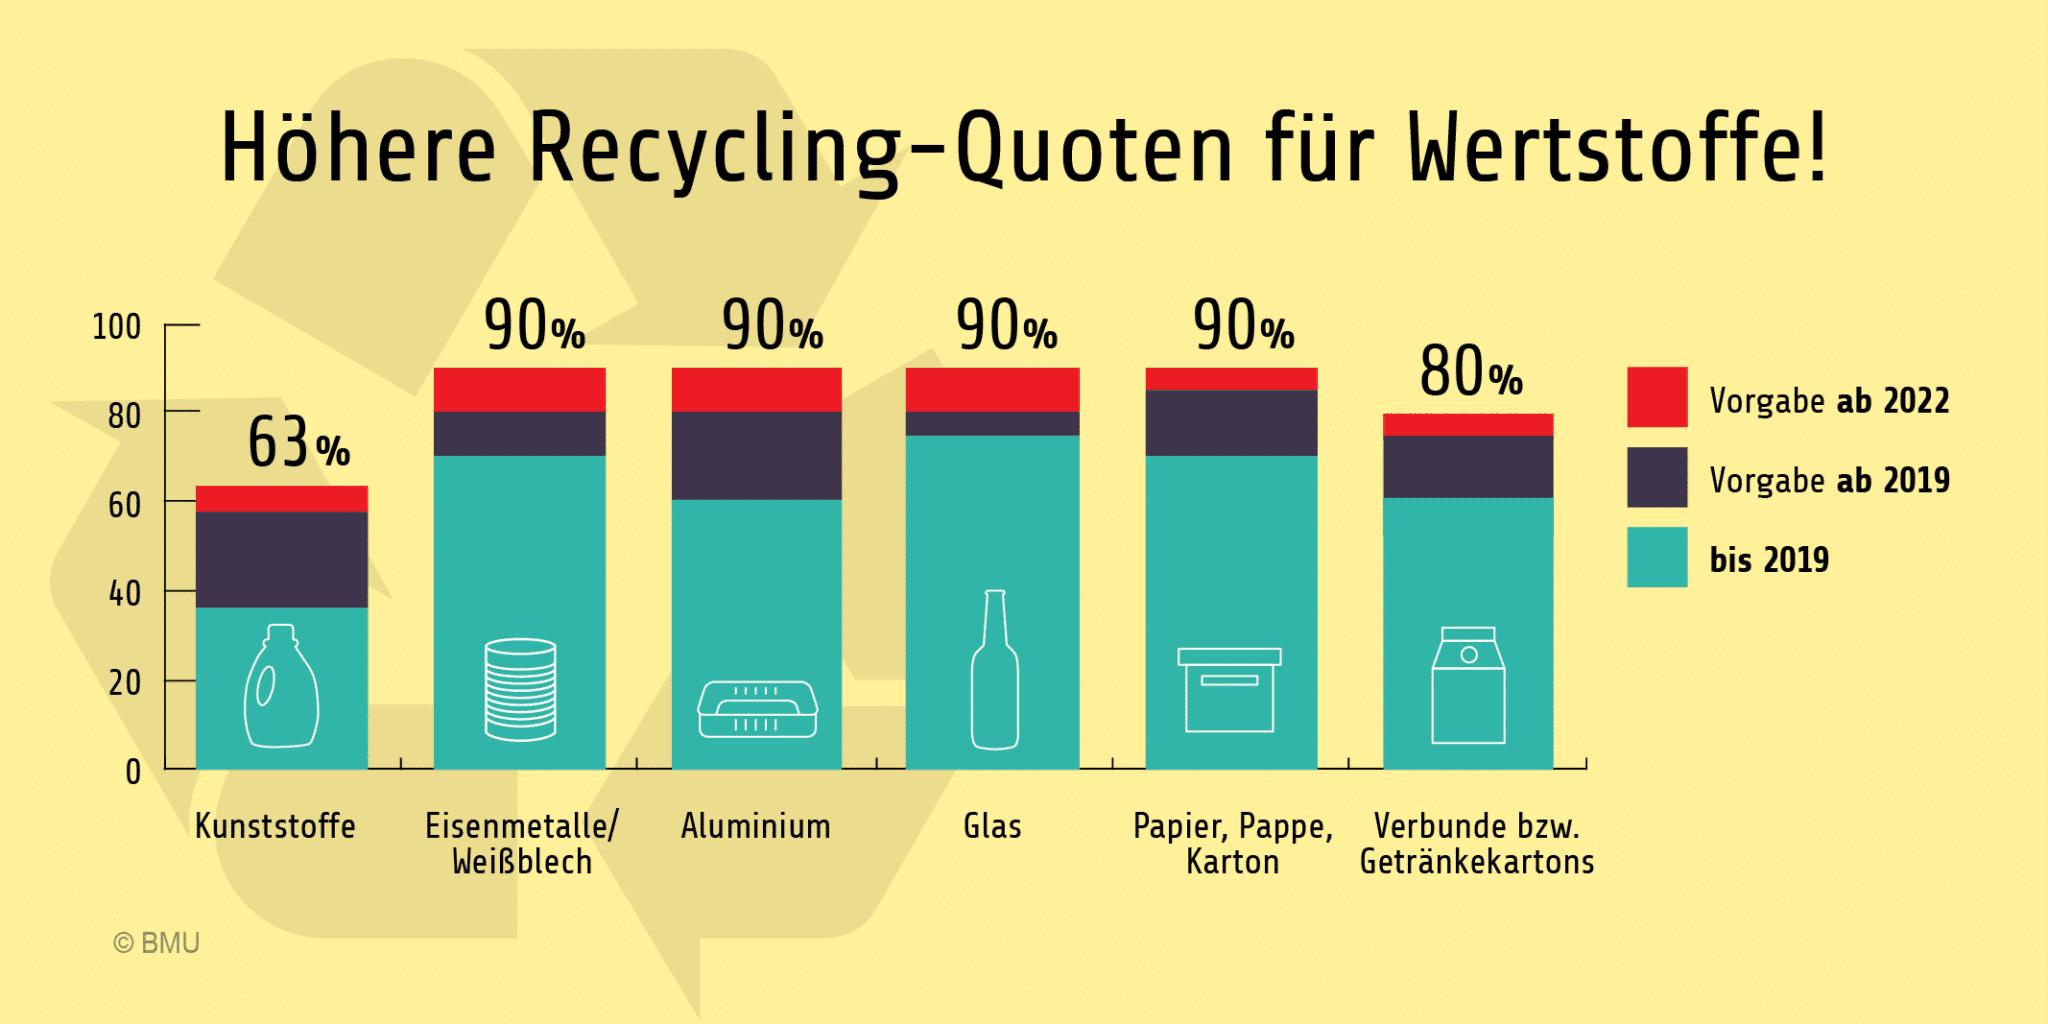 Wie Viel Plastik Wird Recycelt